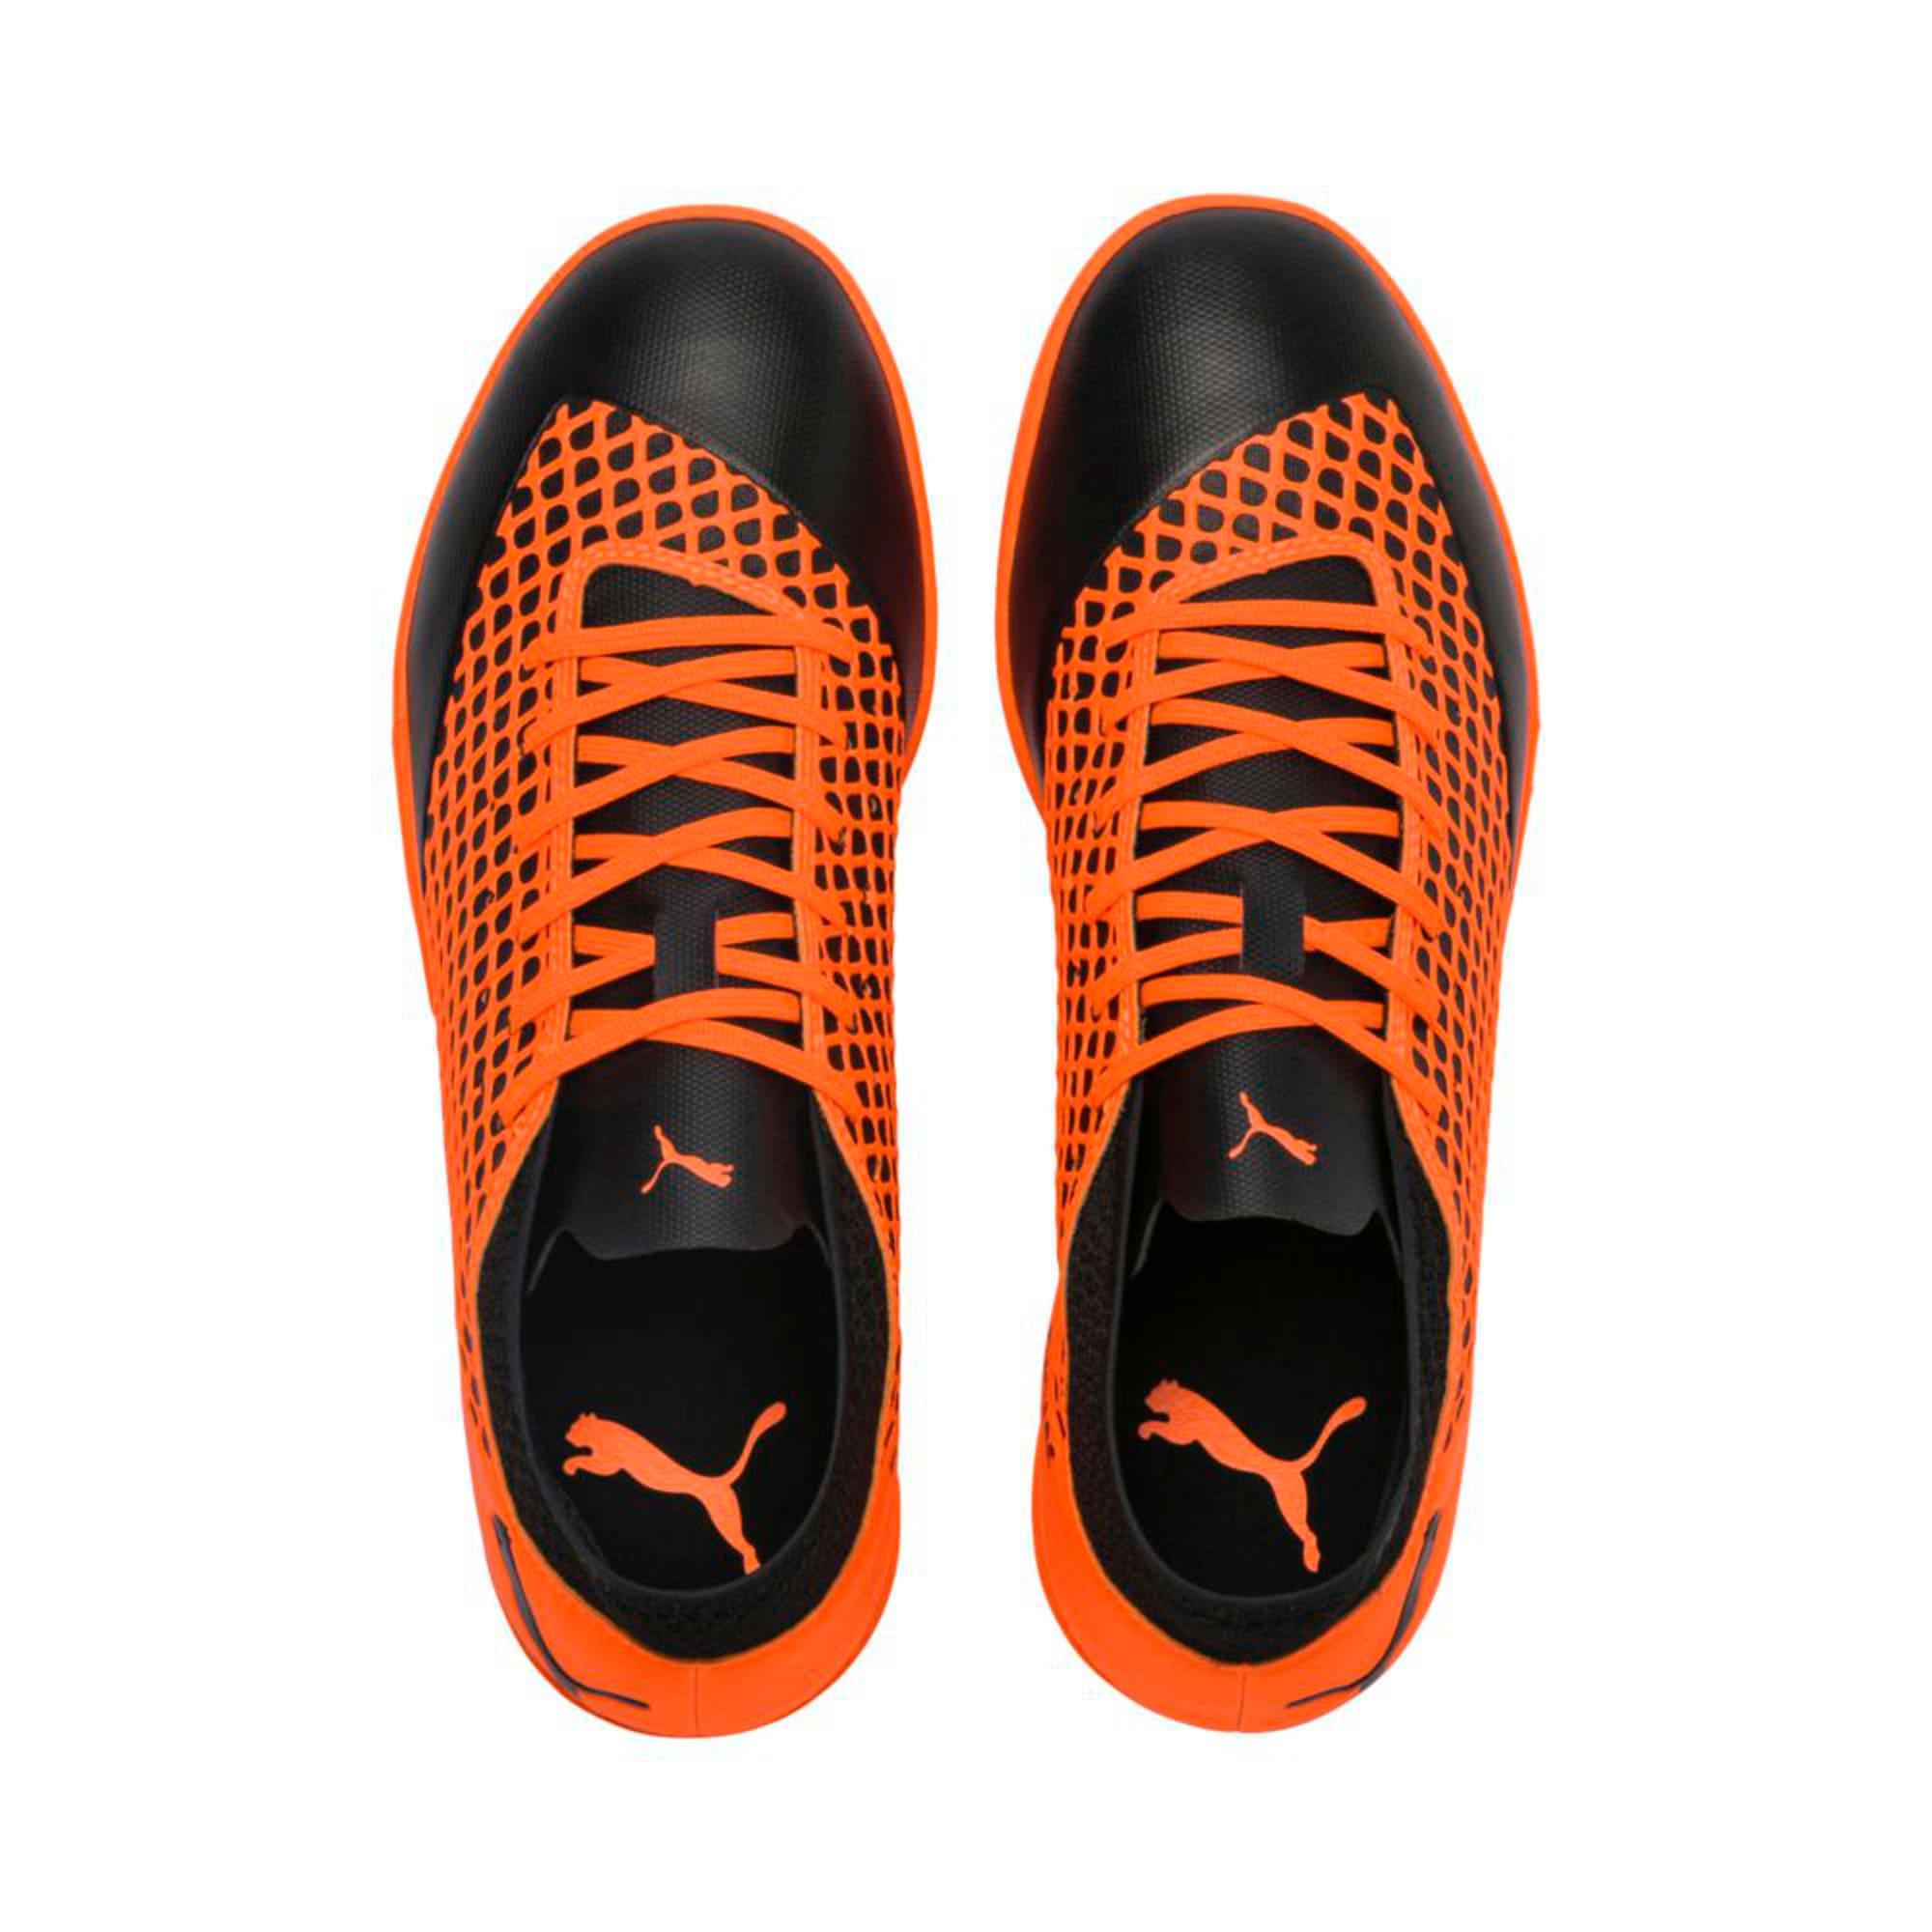 Thumbnail 3 of FUTURE 2.4 TT Men's Football Boots, Puma Black-Shocking Orange, medium-IND